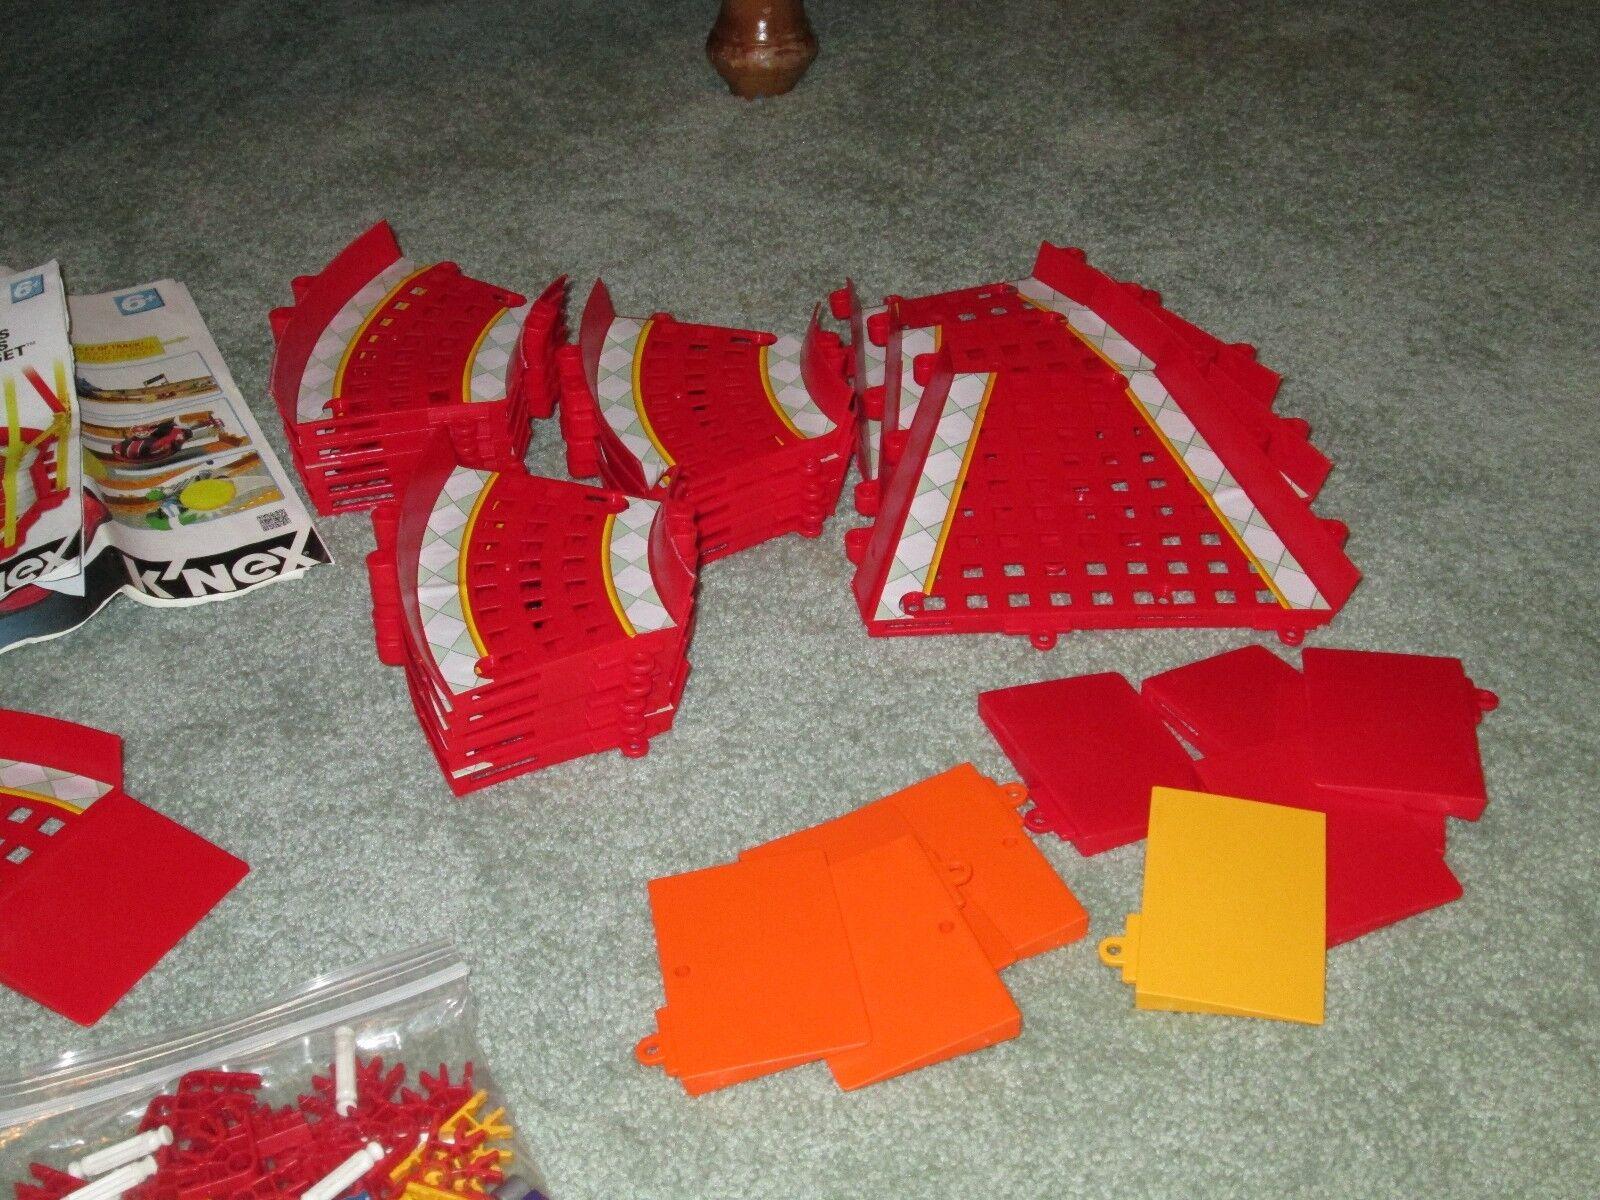 HUGE LOT K'NEX K'NEX K'NEX MARIO KART LUIGI CART MARIO & YOSHI Motorized CARTS GOOMBAS SET + 17f843